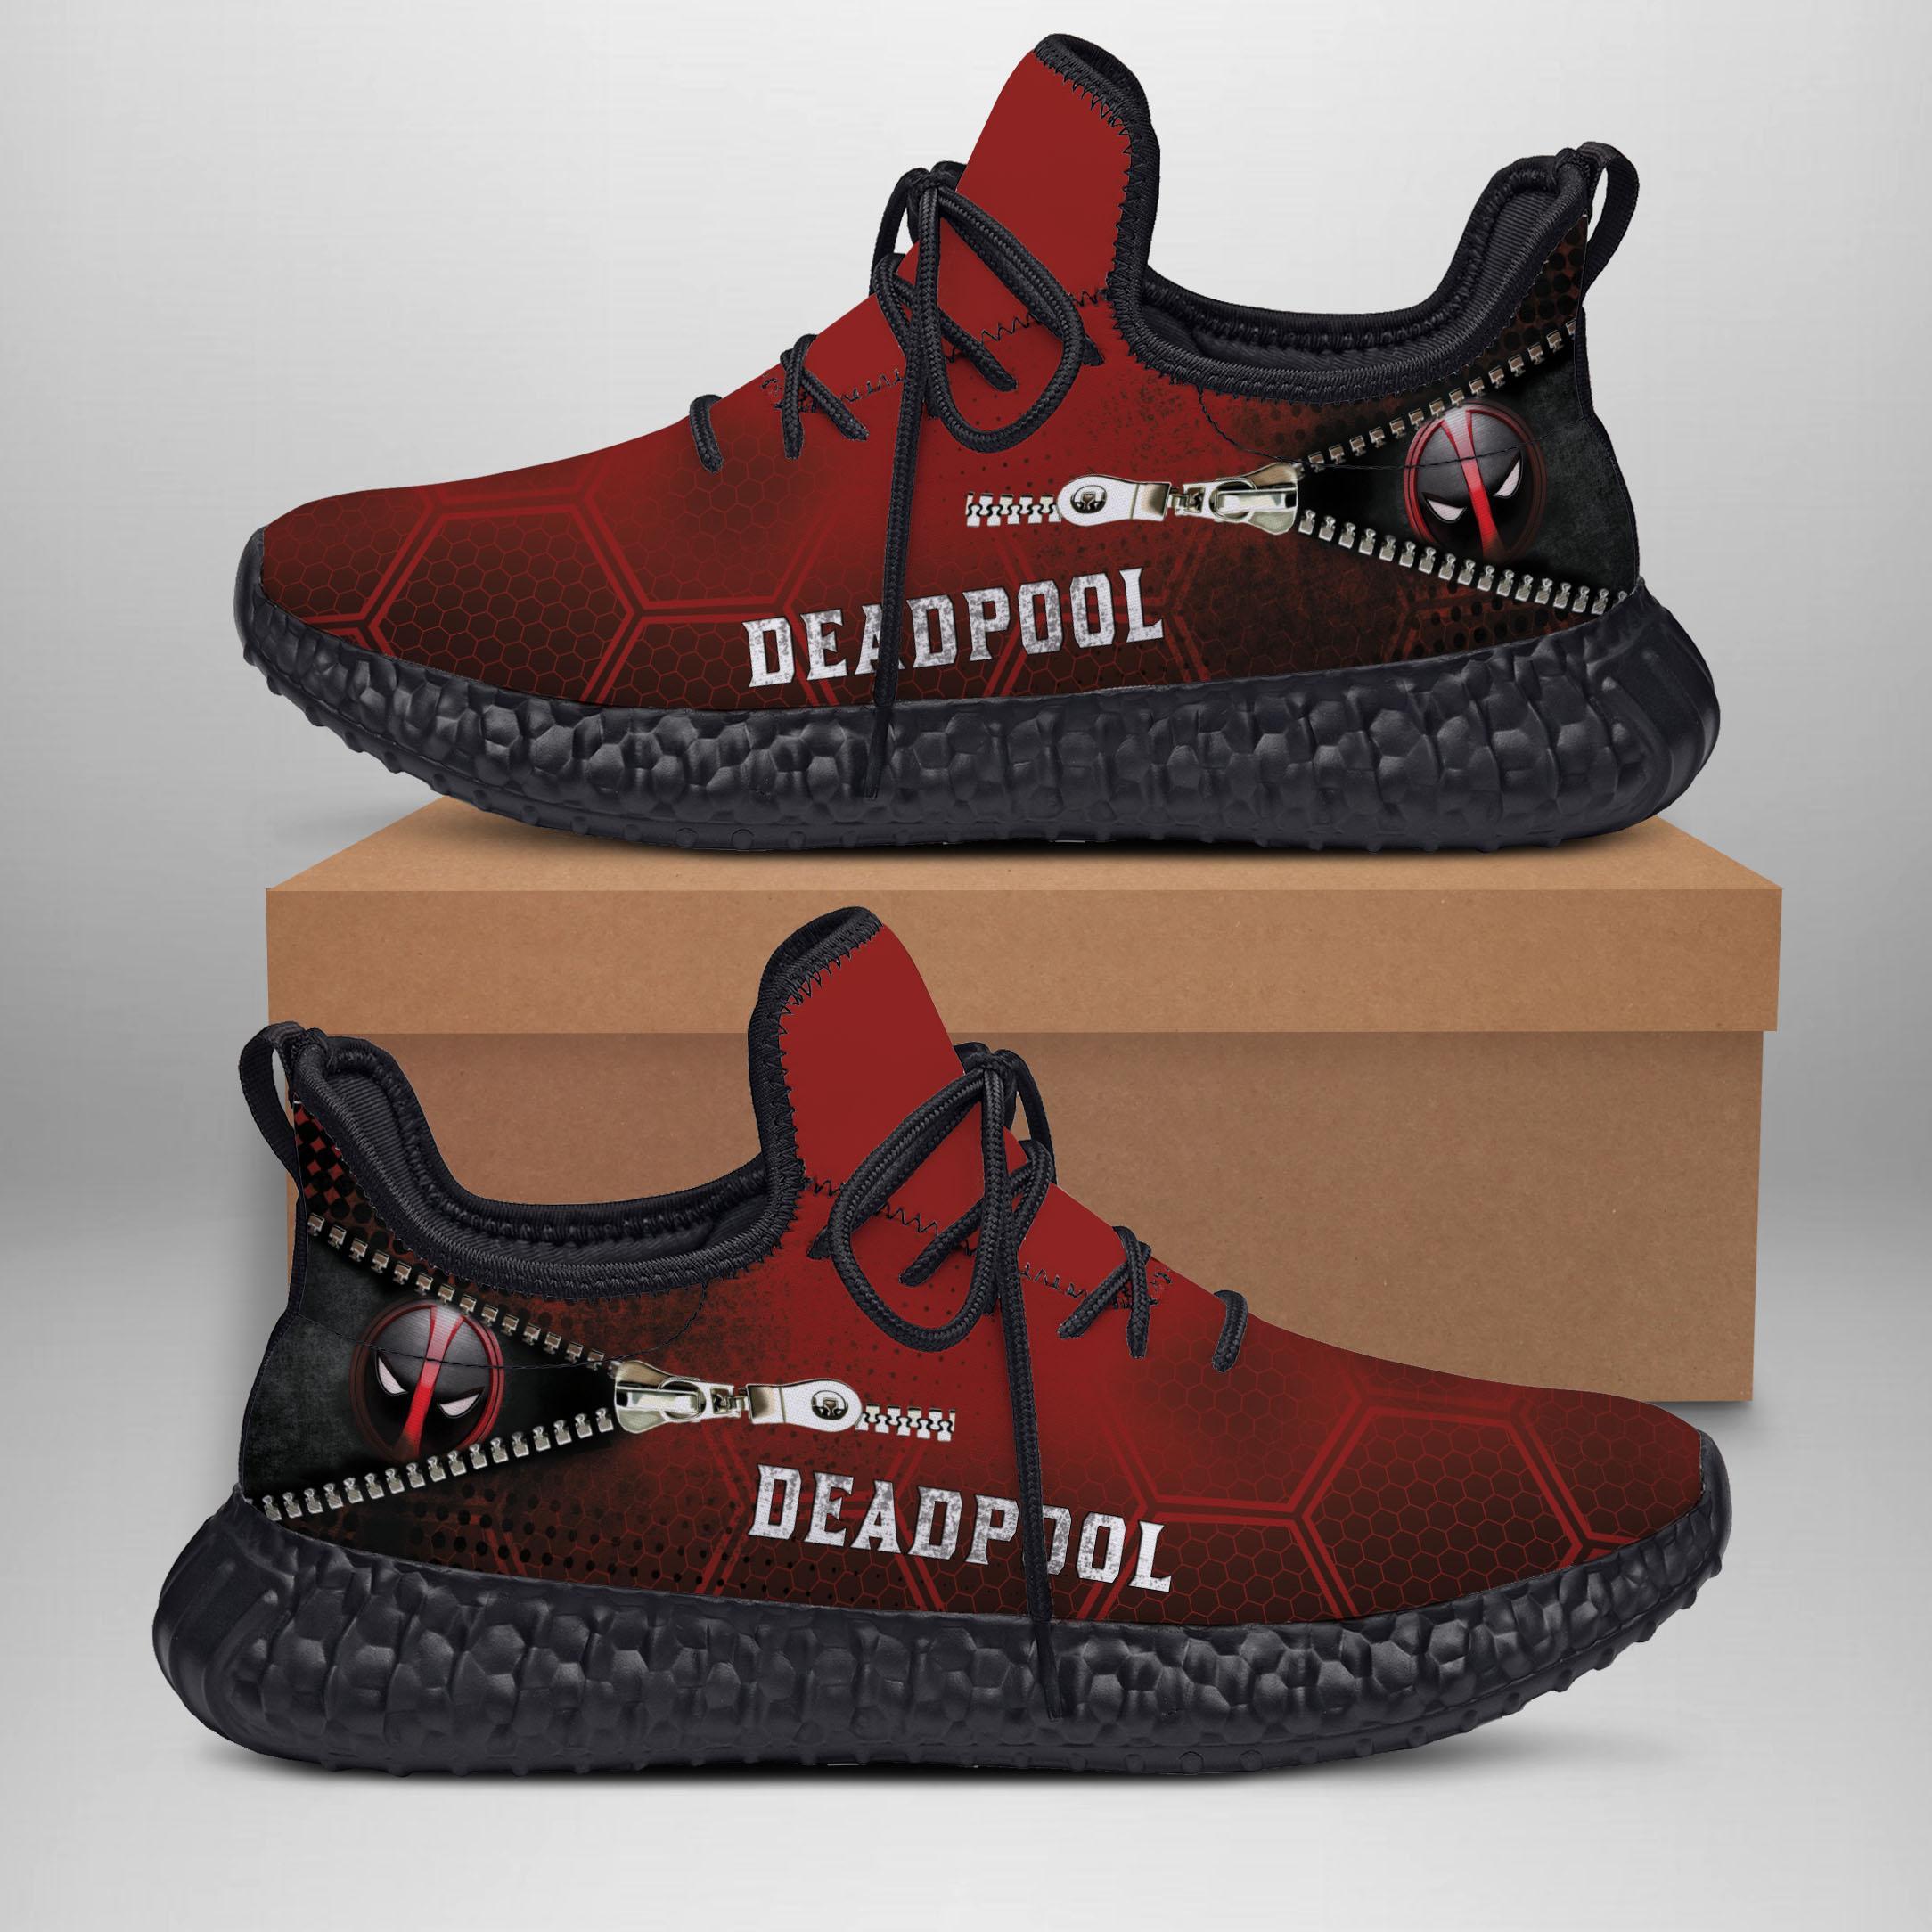 DEADPOOL  Yeezy Sneakers Shoes For Men, Women, Runing Yeezy Sneakers Shoes. Custom Yeezy Sneakers Shoes SNEAKERS